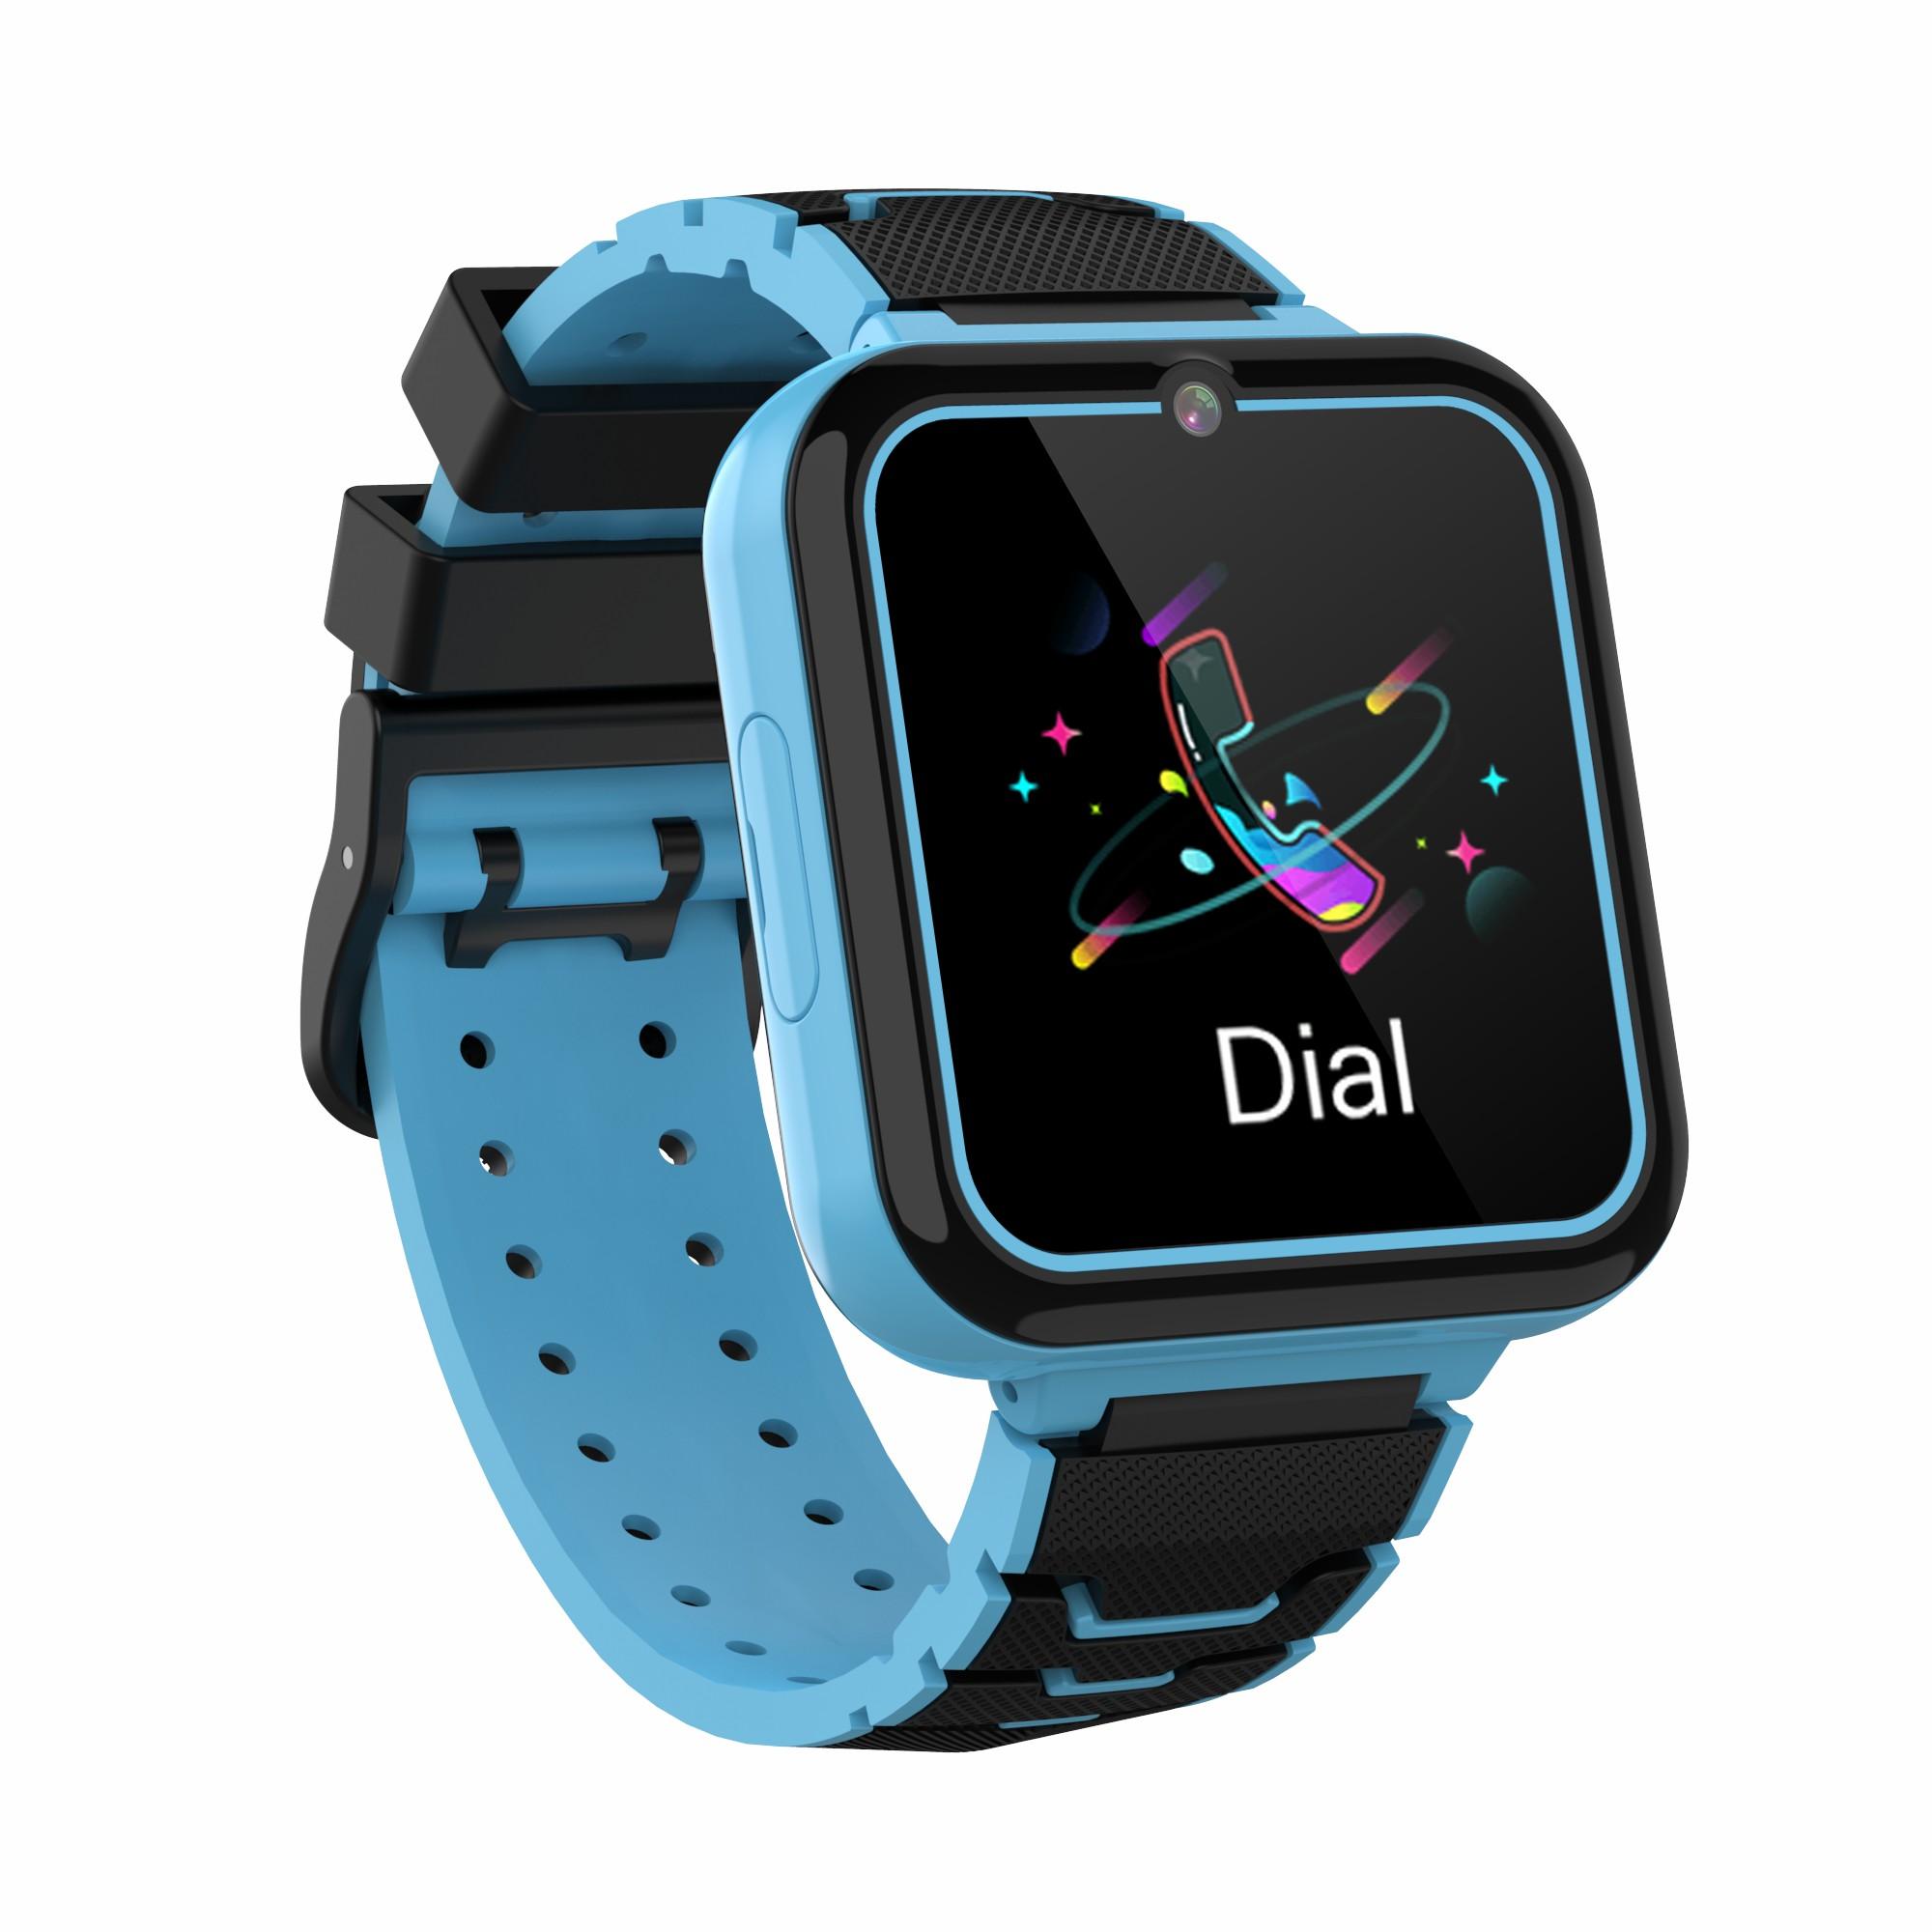 Y16 Kids Smart Watch Multi-language Ips Screen Game Camera Video Phone Smartwatch blue